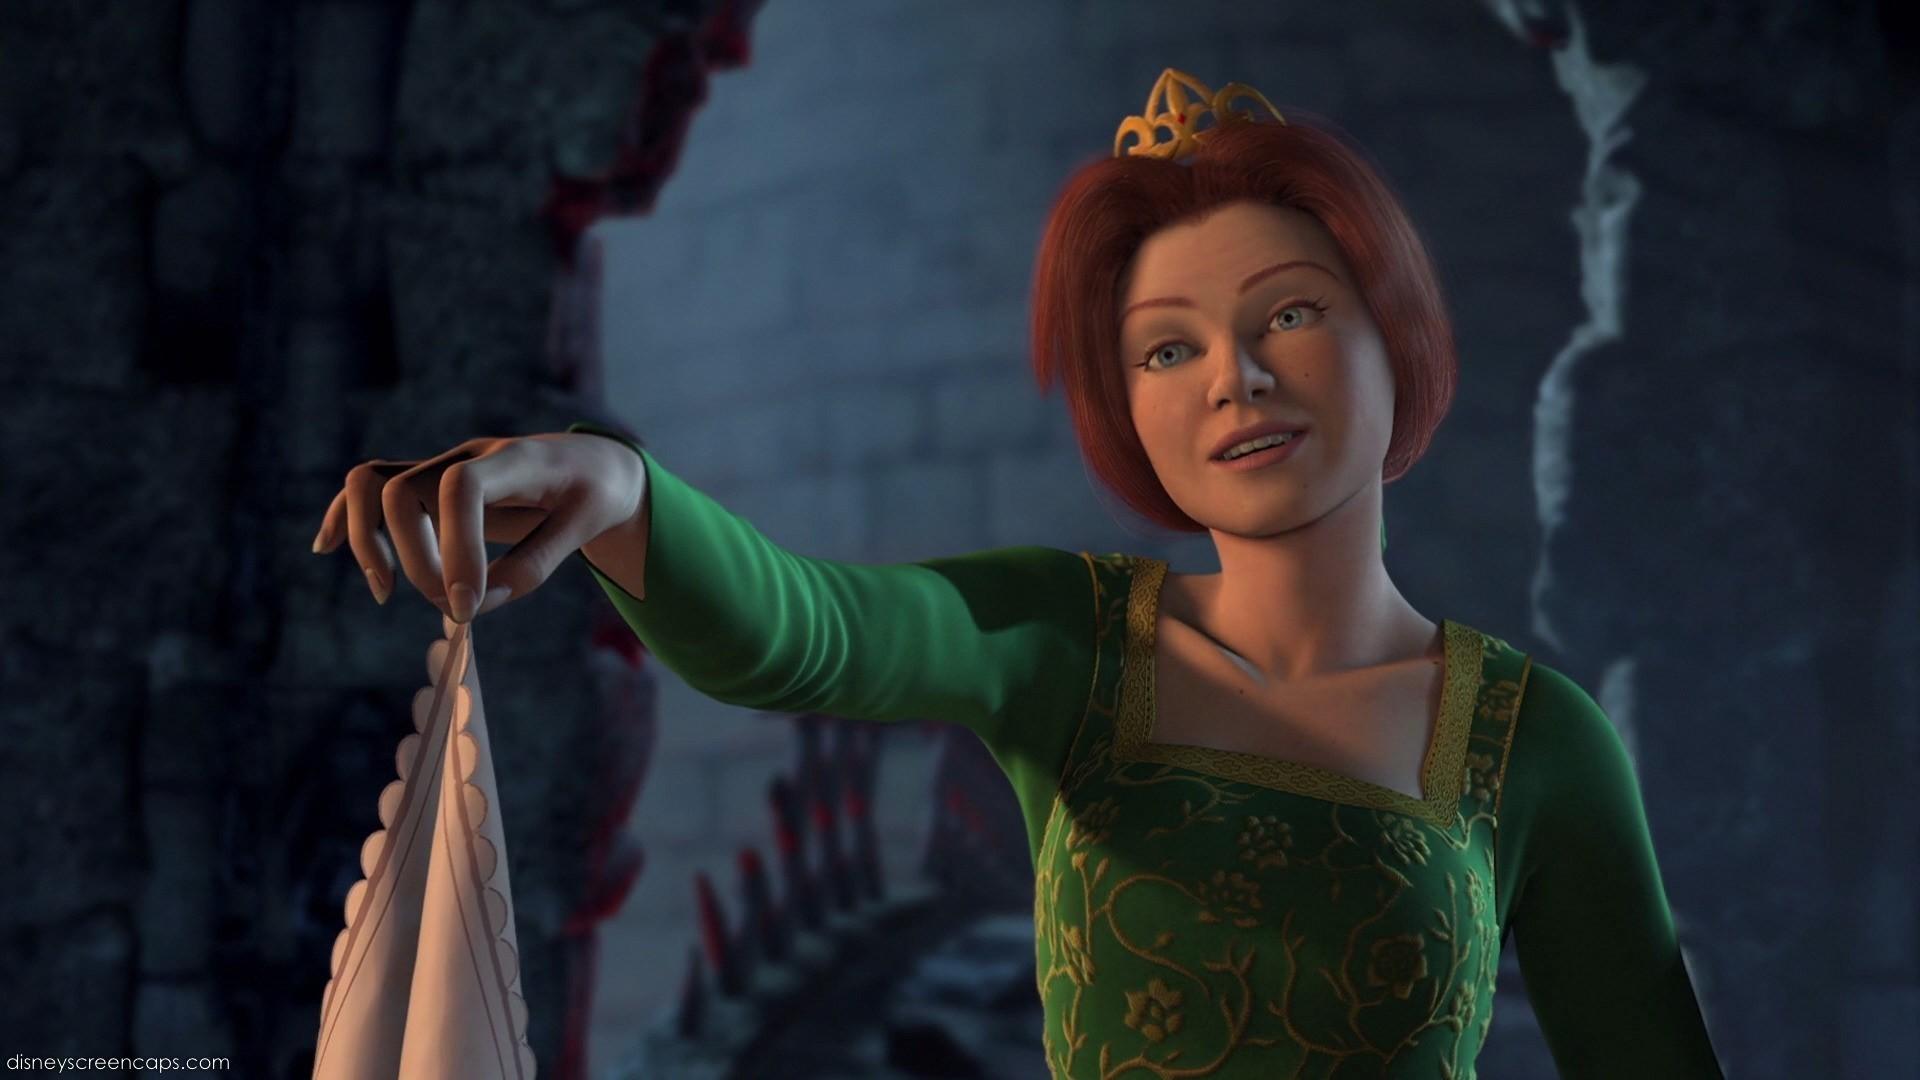 Princess Fiona (voice of Cameron Diaz, Shrek franchise)